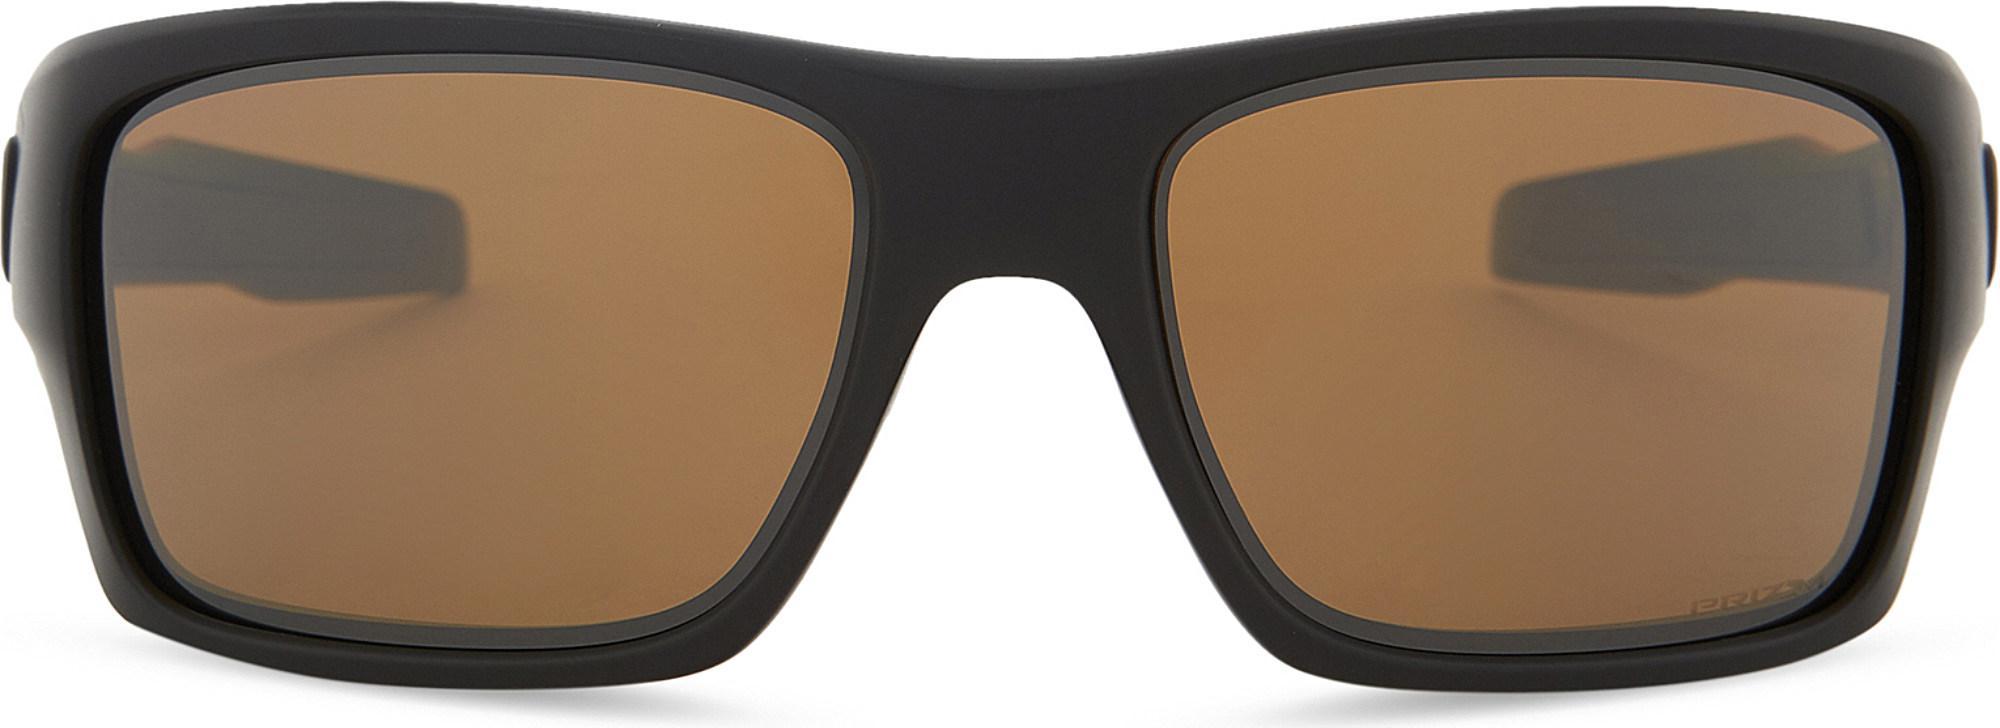 2d73063c45 Oakley. Women s Black Turbine Polarised Prizmtm Square-frame Wrap-around  Sunglasses